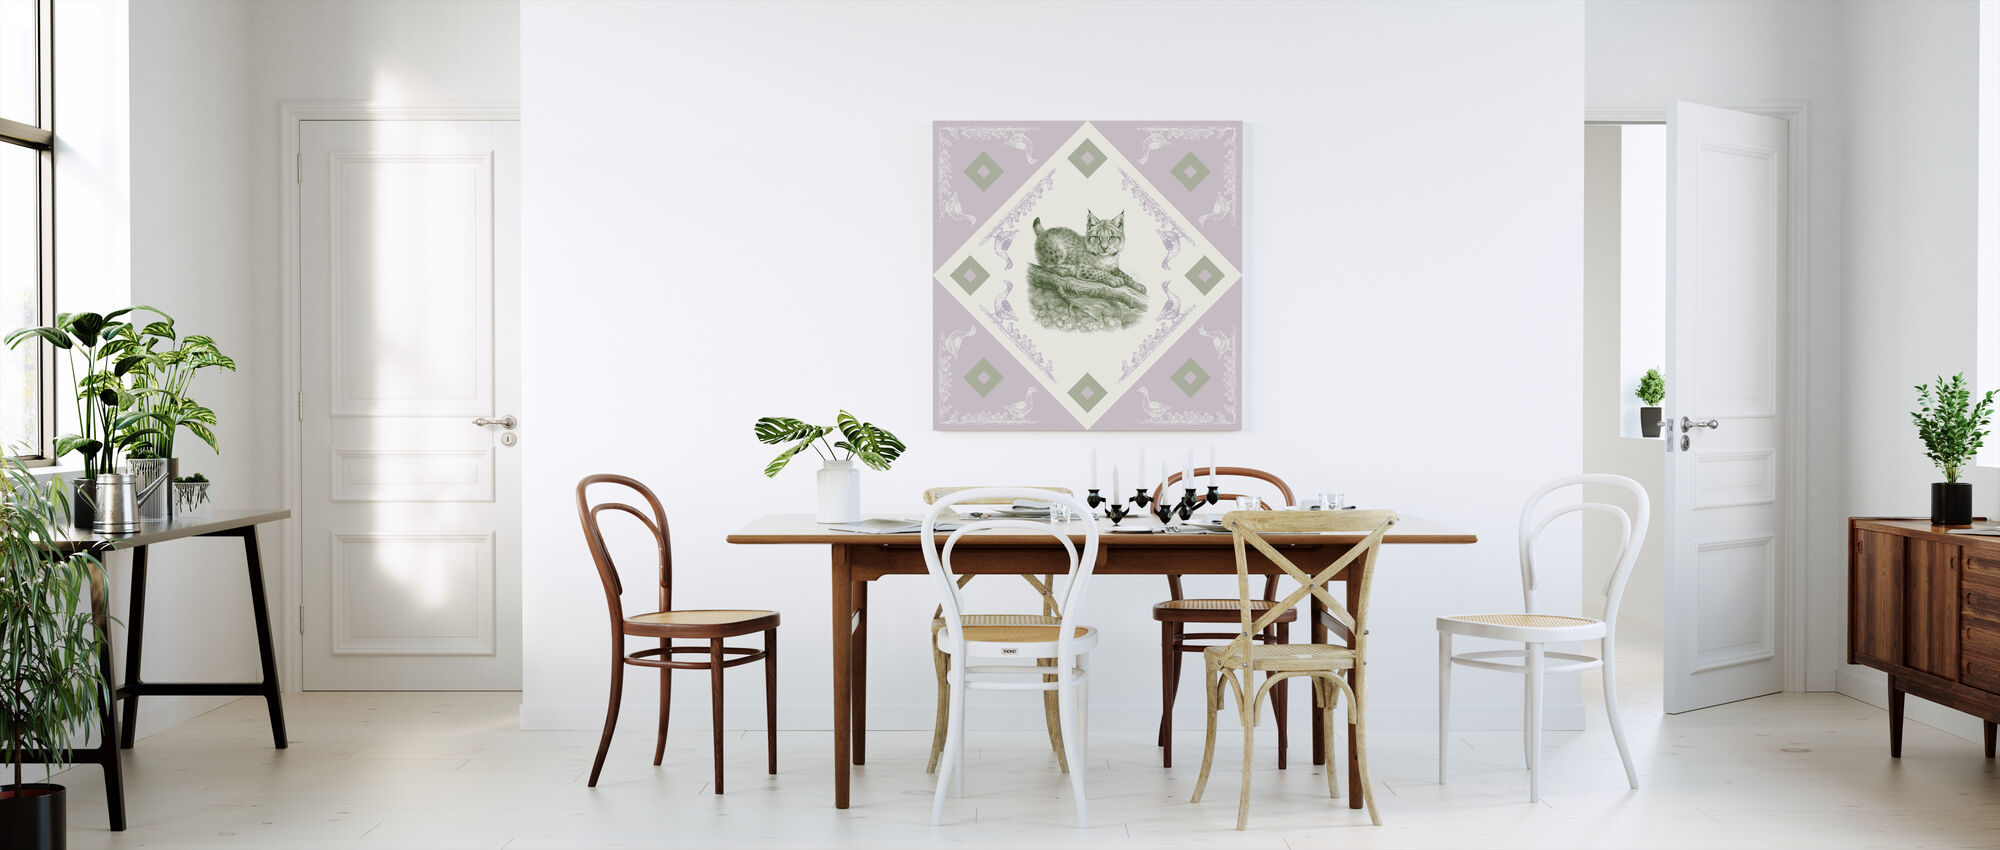 Lynx, Groen Paarse - Canvas print - Keuken